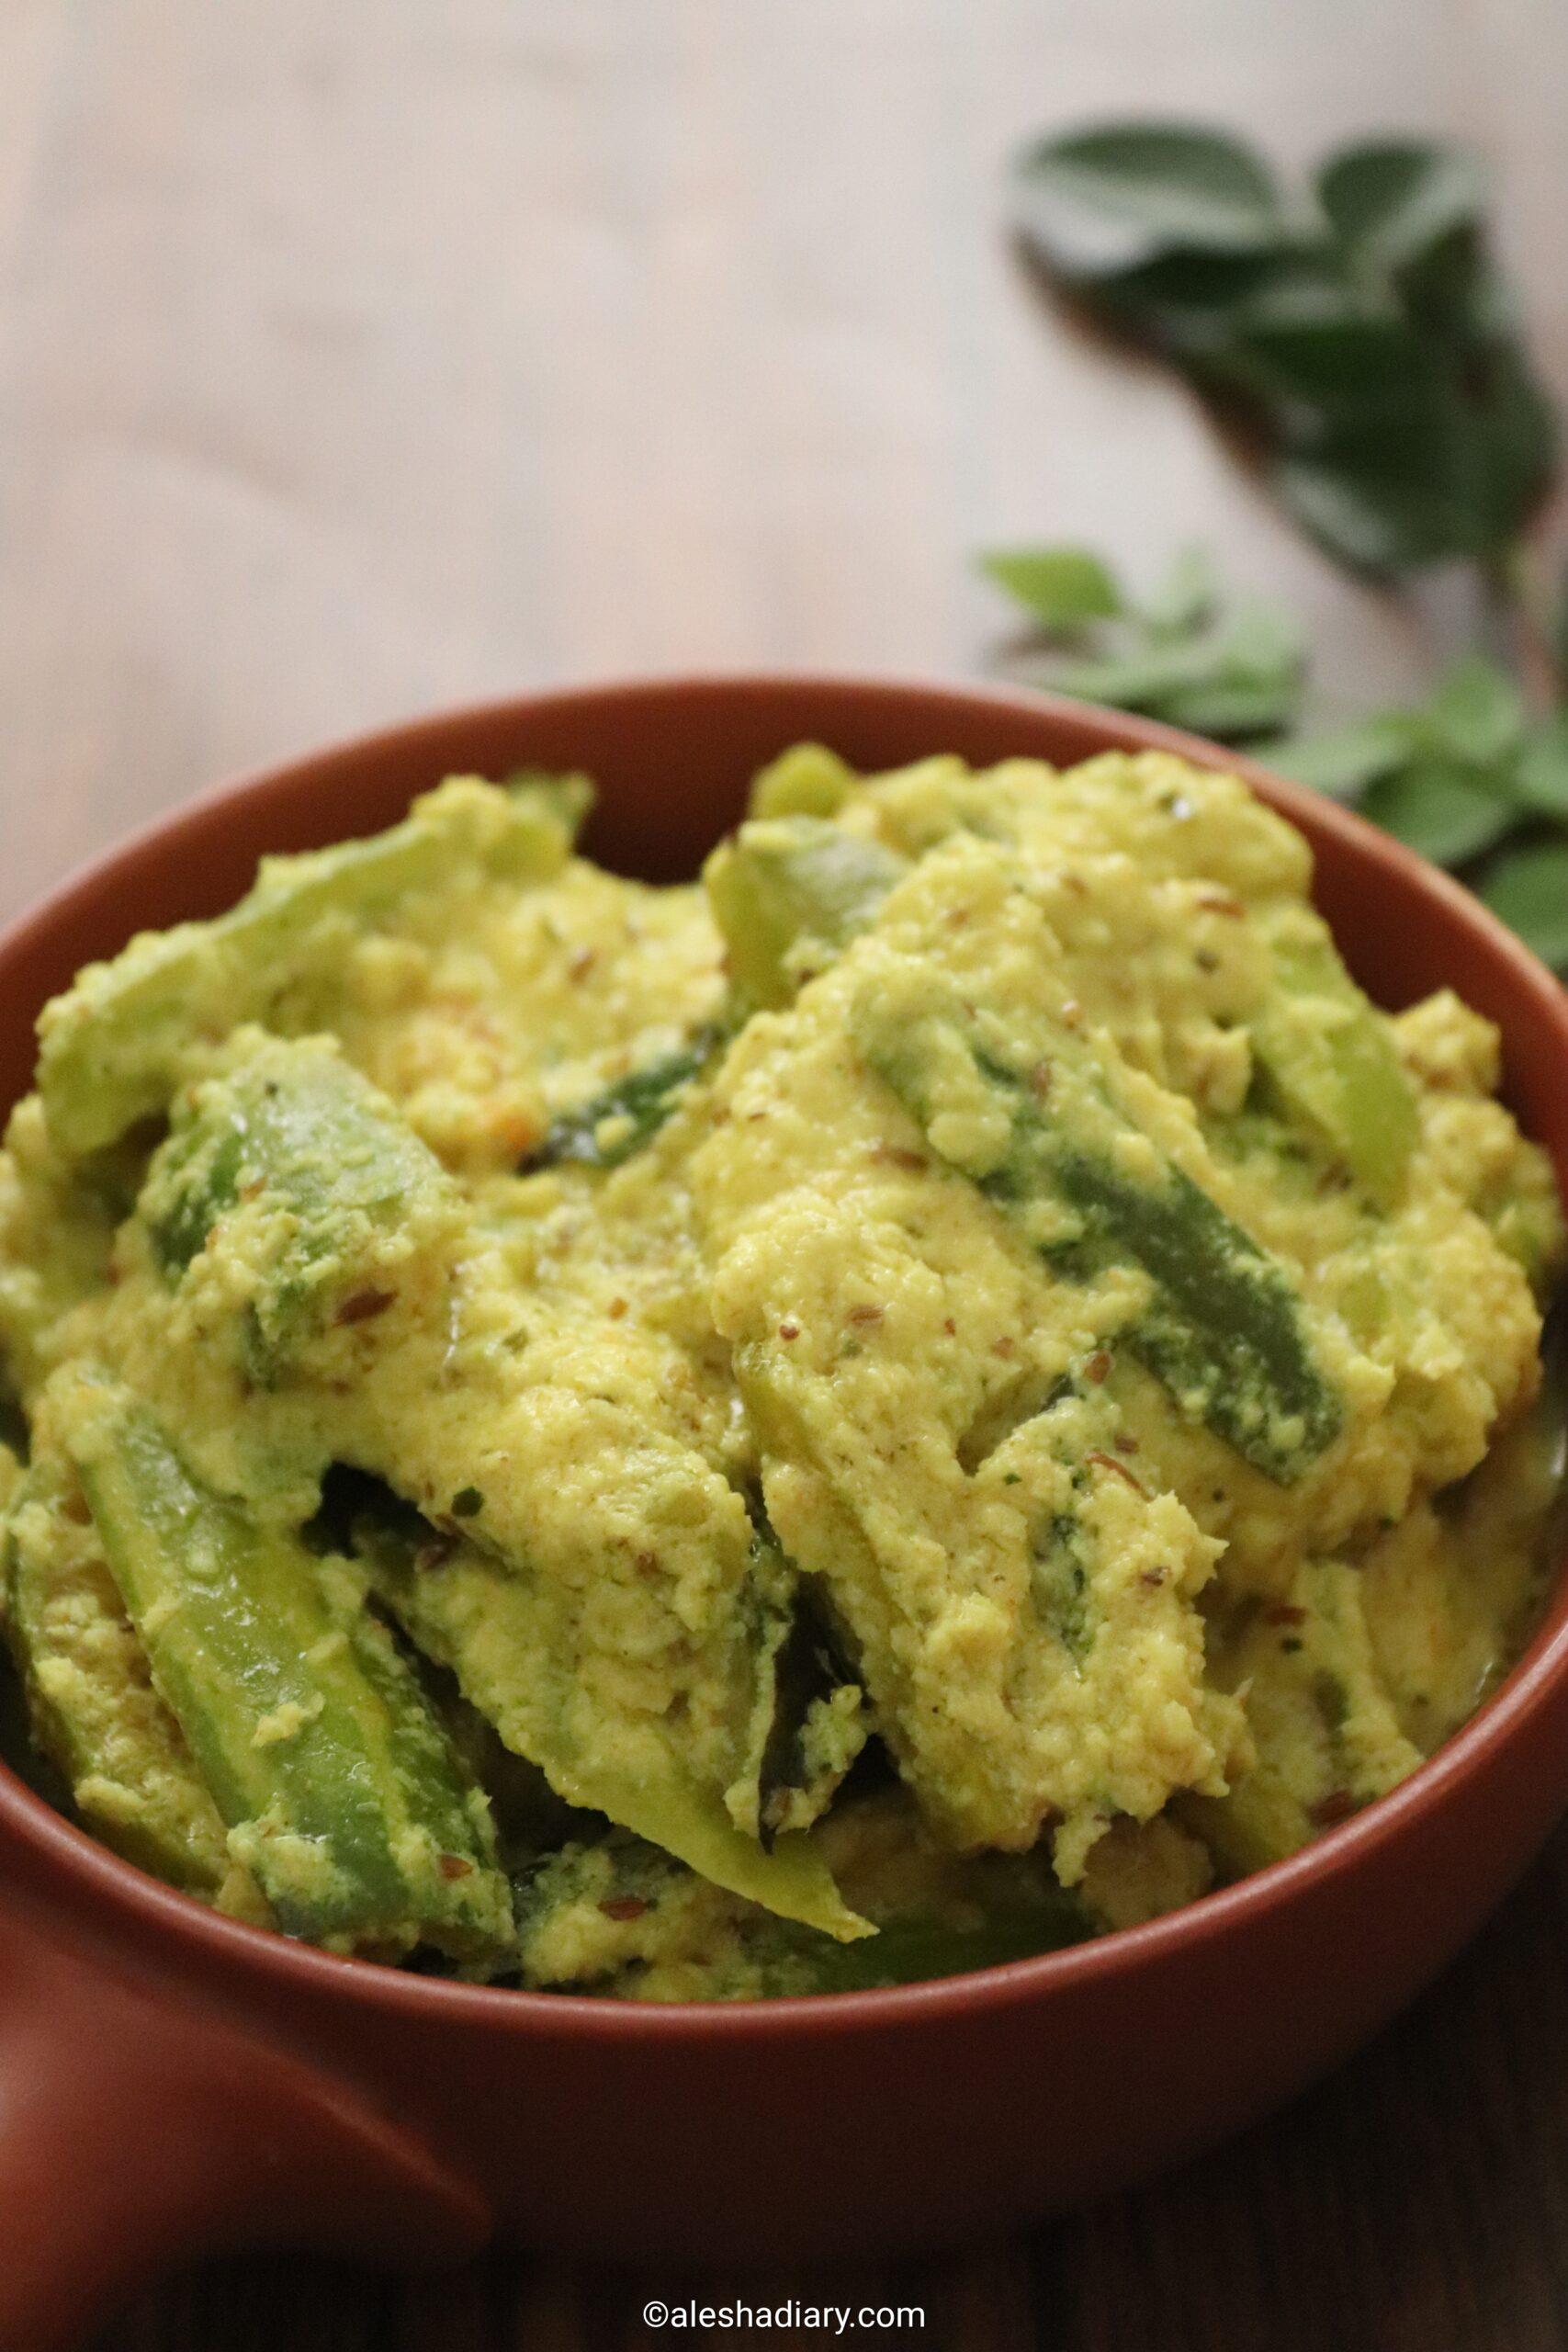 Kovakkai aviyal – Tindora coconut yoghurt curry